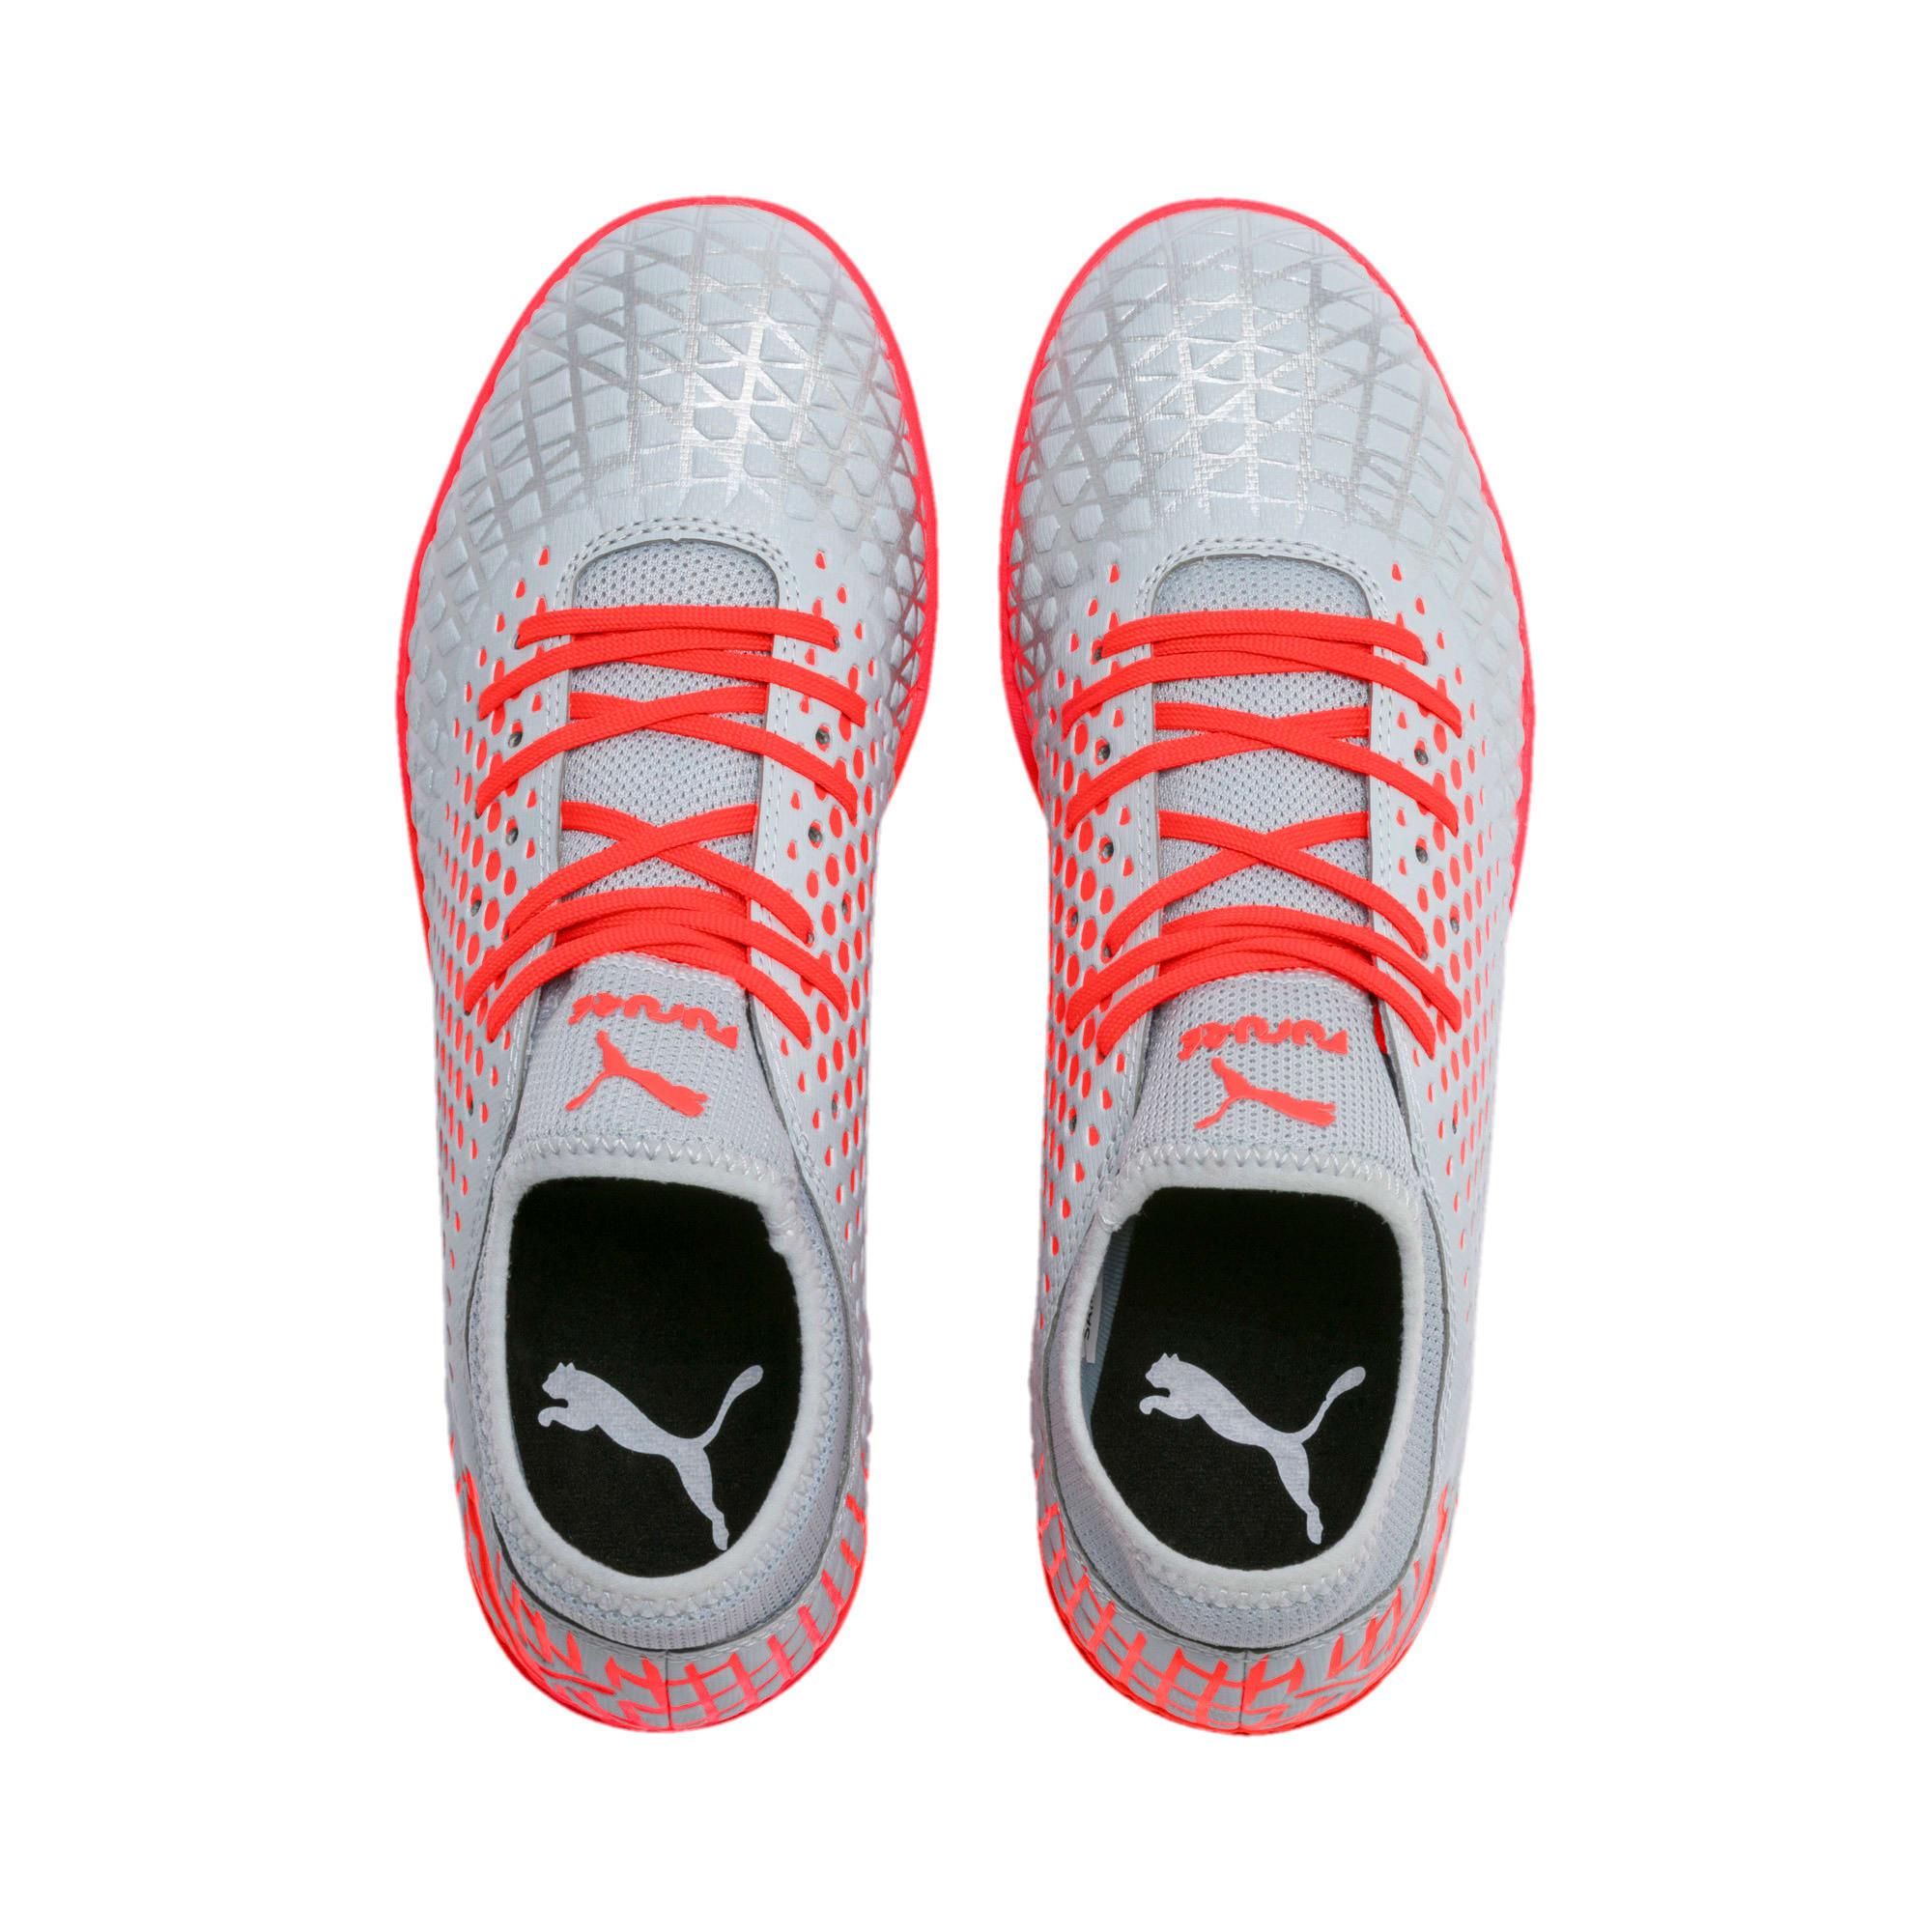 Thumbnail 8 of FUTURE 4.4 TT Men's Football Boots, Glacial Blue-Nrgy Red, medium-IND